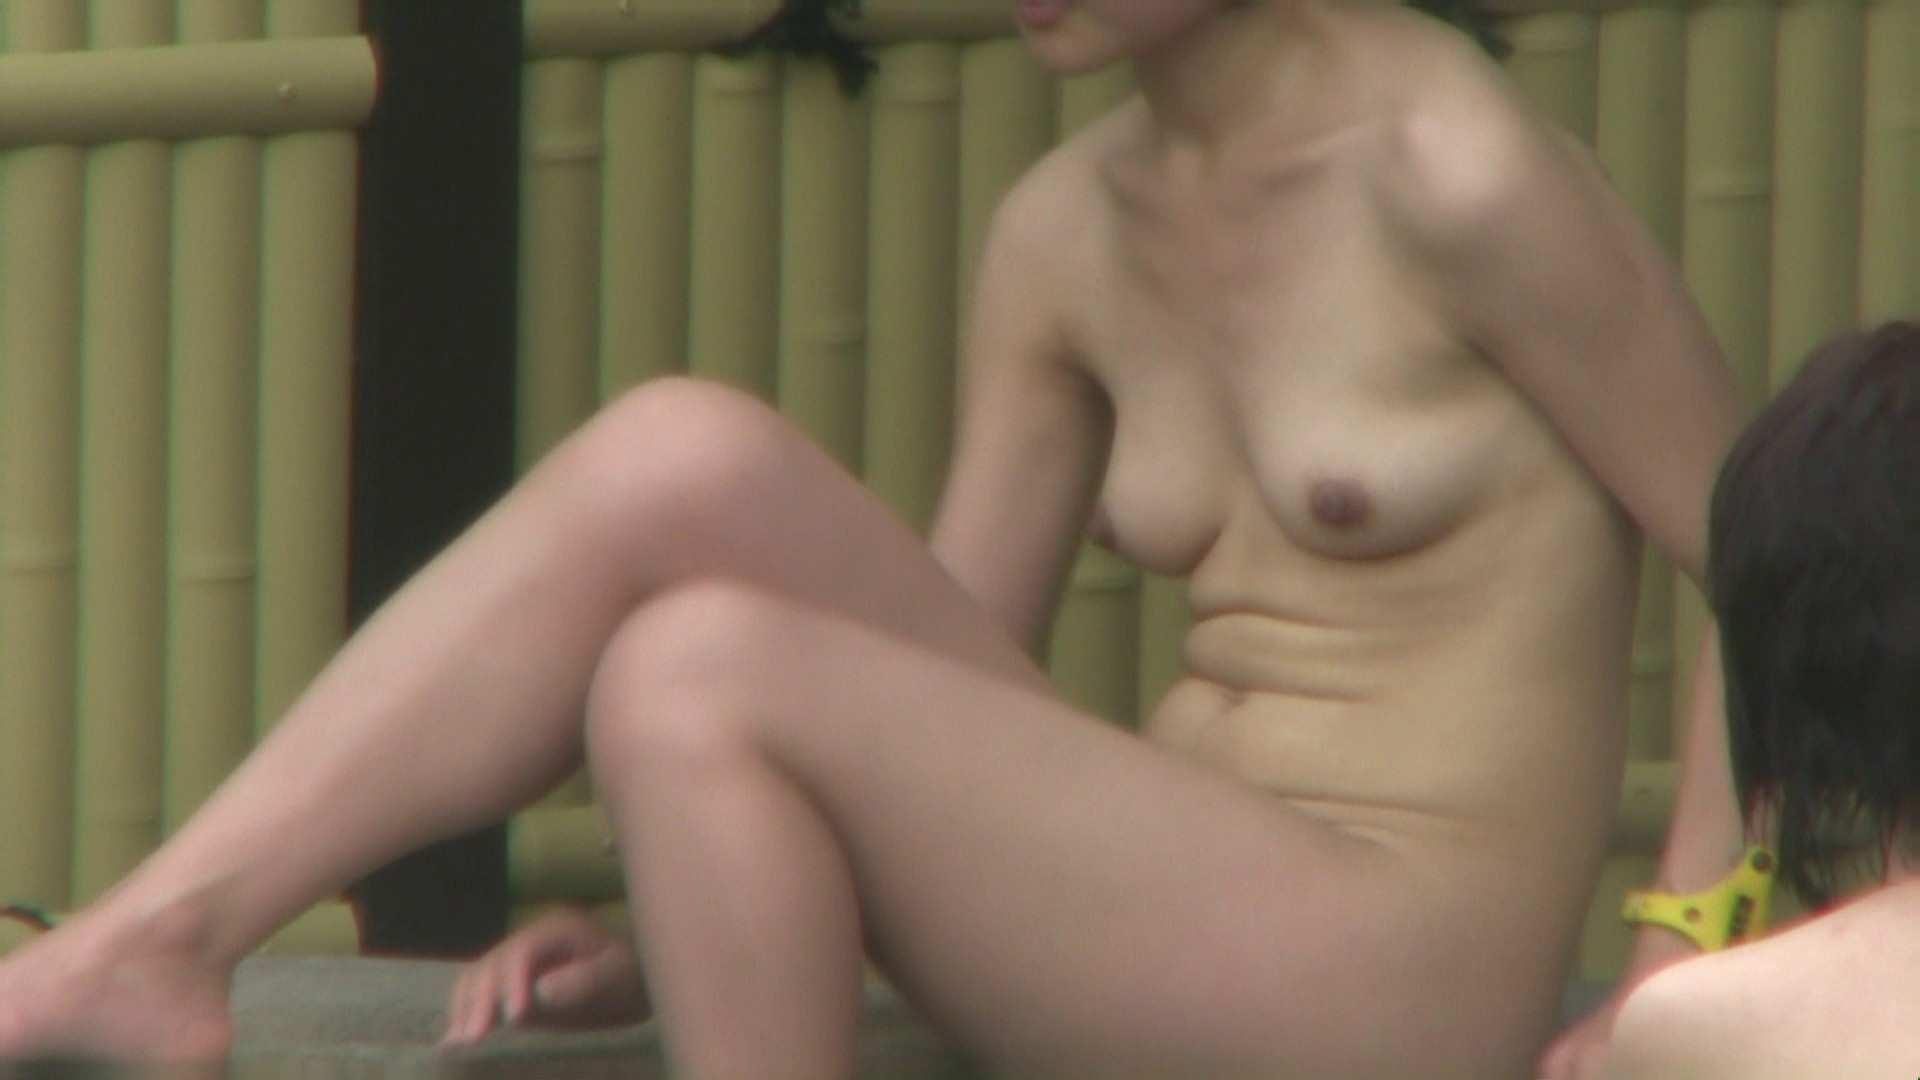 Aquaな露天風呂Vol.74【VIP限定】 盗撮 隠し撮りオマンコ動画紹介 68画像 11